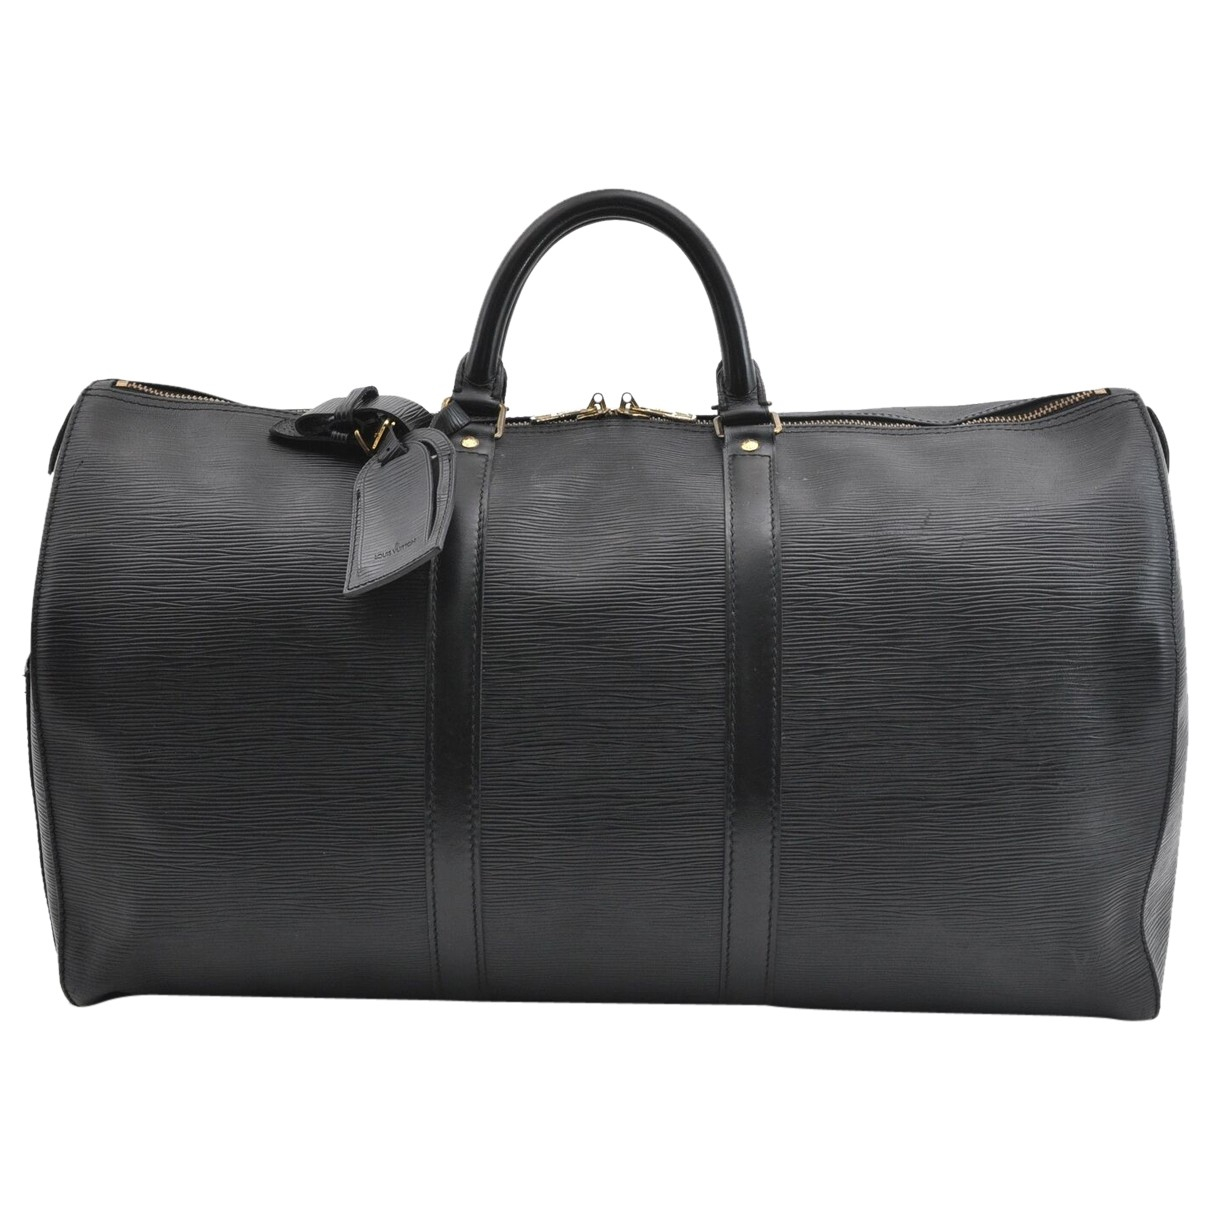 Louis Vuitton N Black Leather Travel bag for Women N